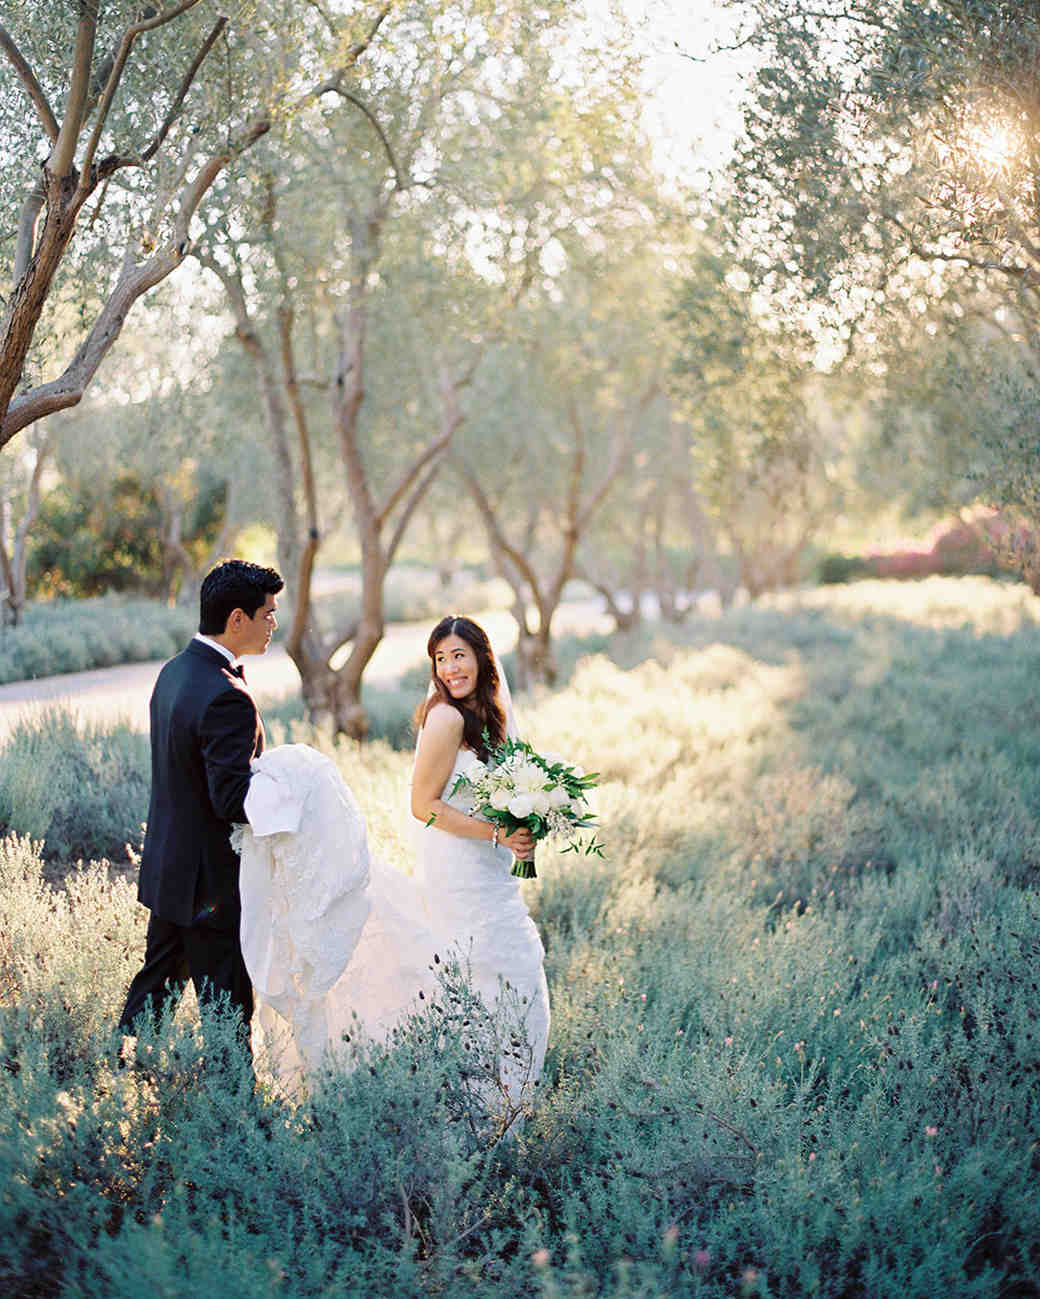 wedding-day-photography-tips-4-0216.jpg